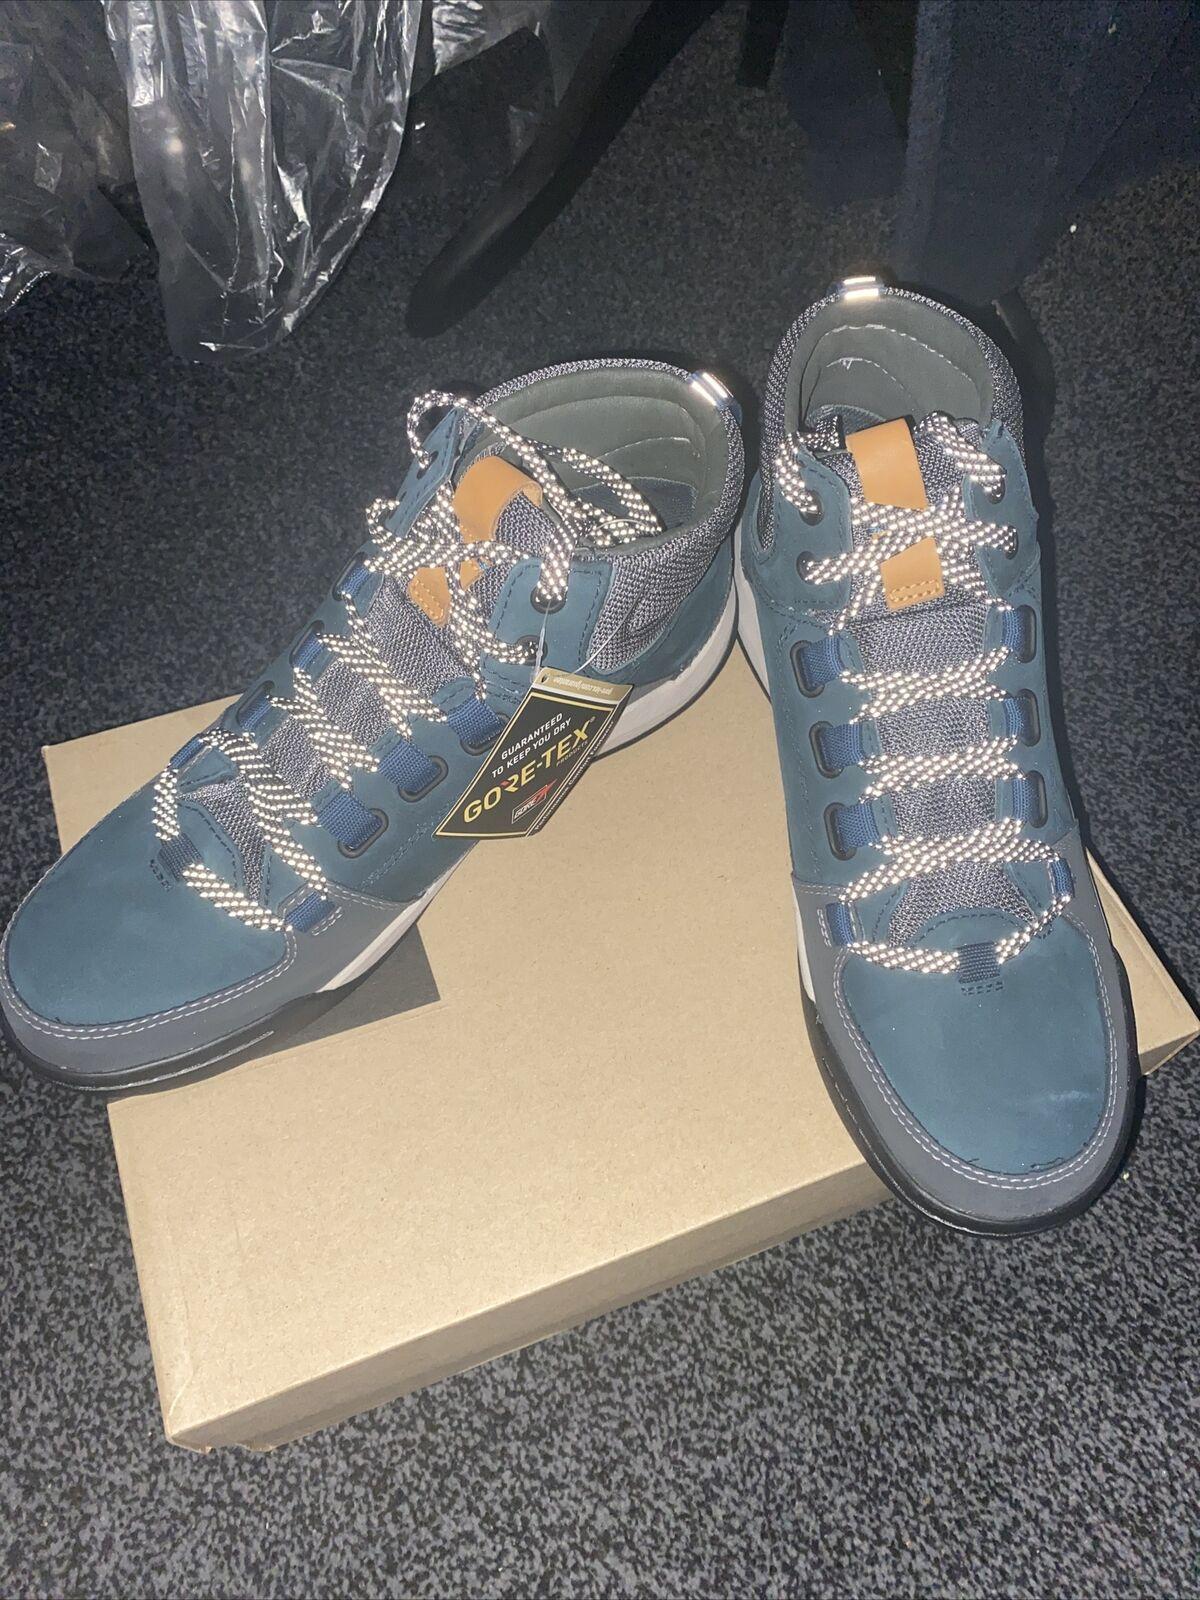 Clarks BNIB Mens Walking Hiking Boots ASHCOMBE ARK GTX Dark Teal Leather UK 8